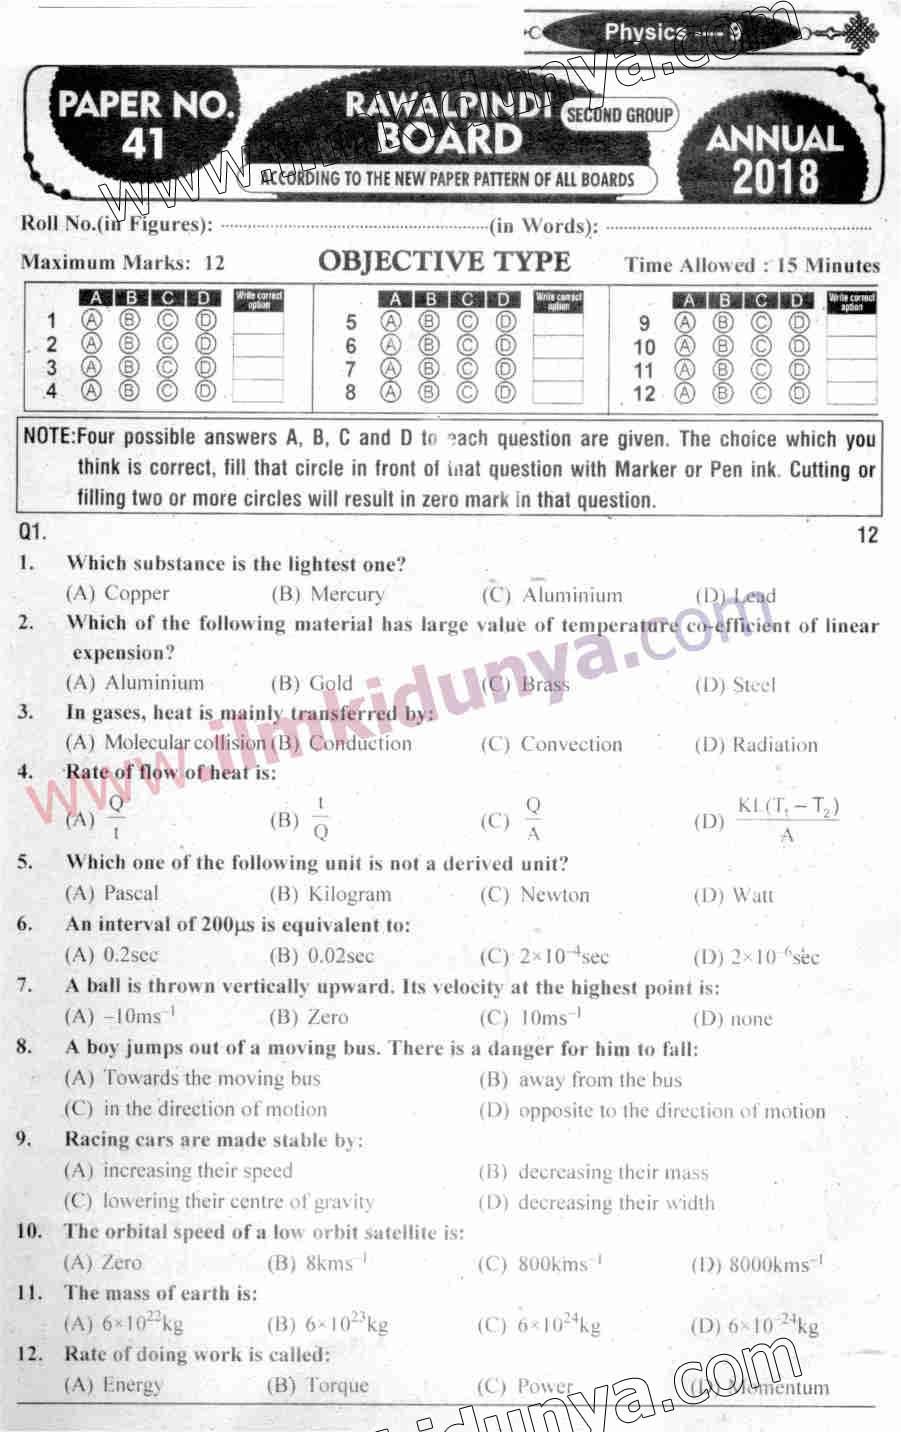 Past Papers 2018 Rawalpindi Board 9th Class Physics